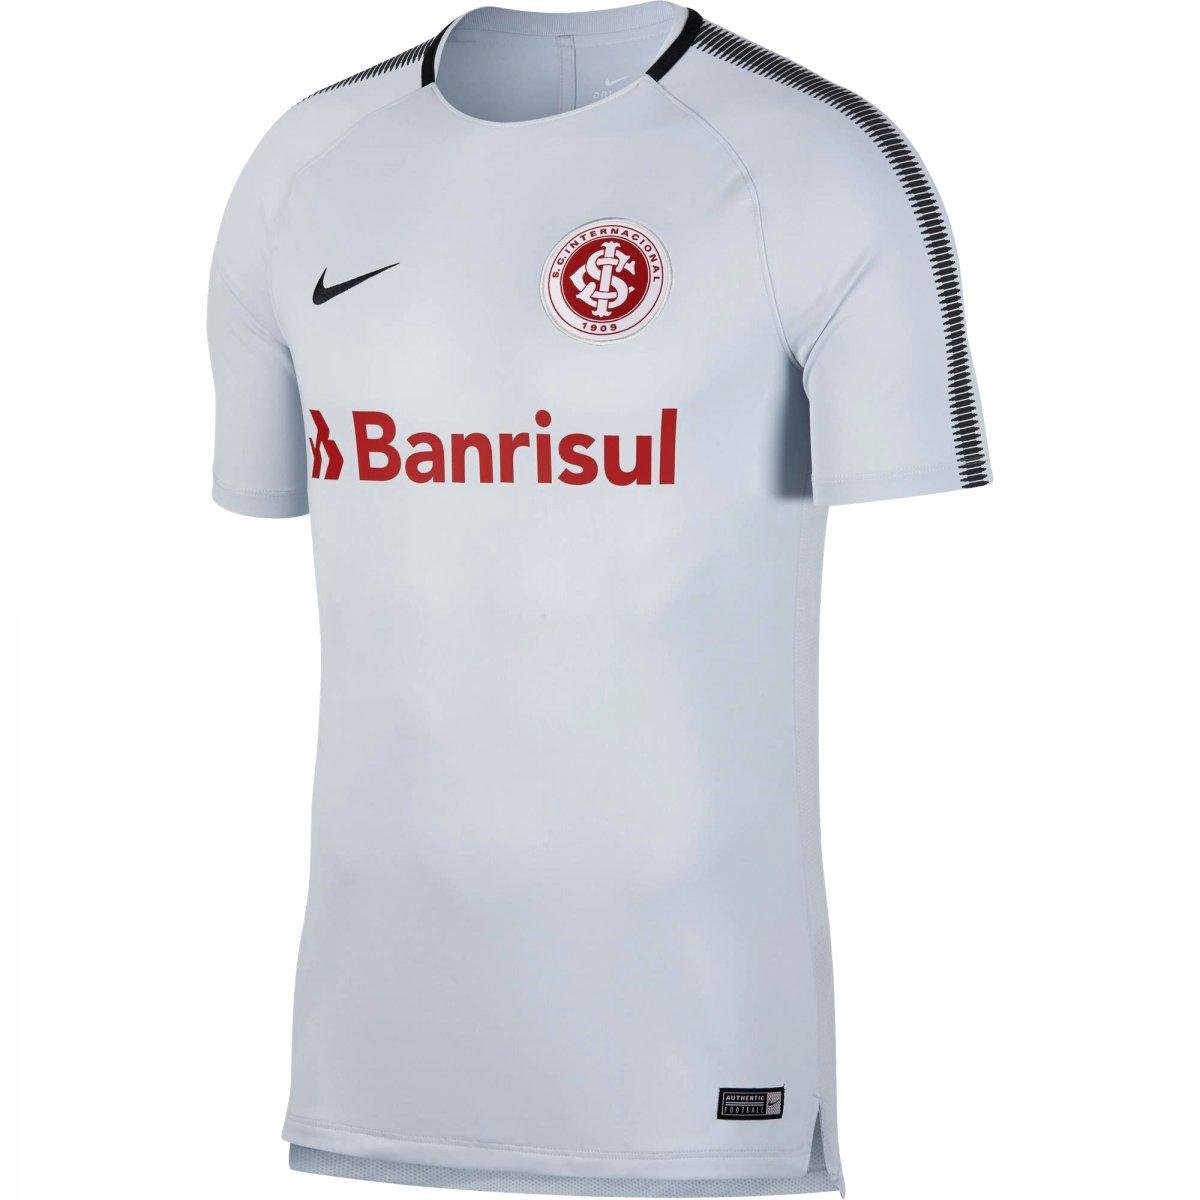 Camiseta Masculina Nike Breathe S.C. Internacional Squad 892639-044 Cinza  Vermelho 1664e60b6b933